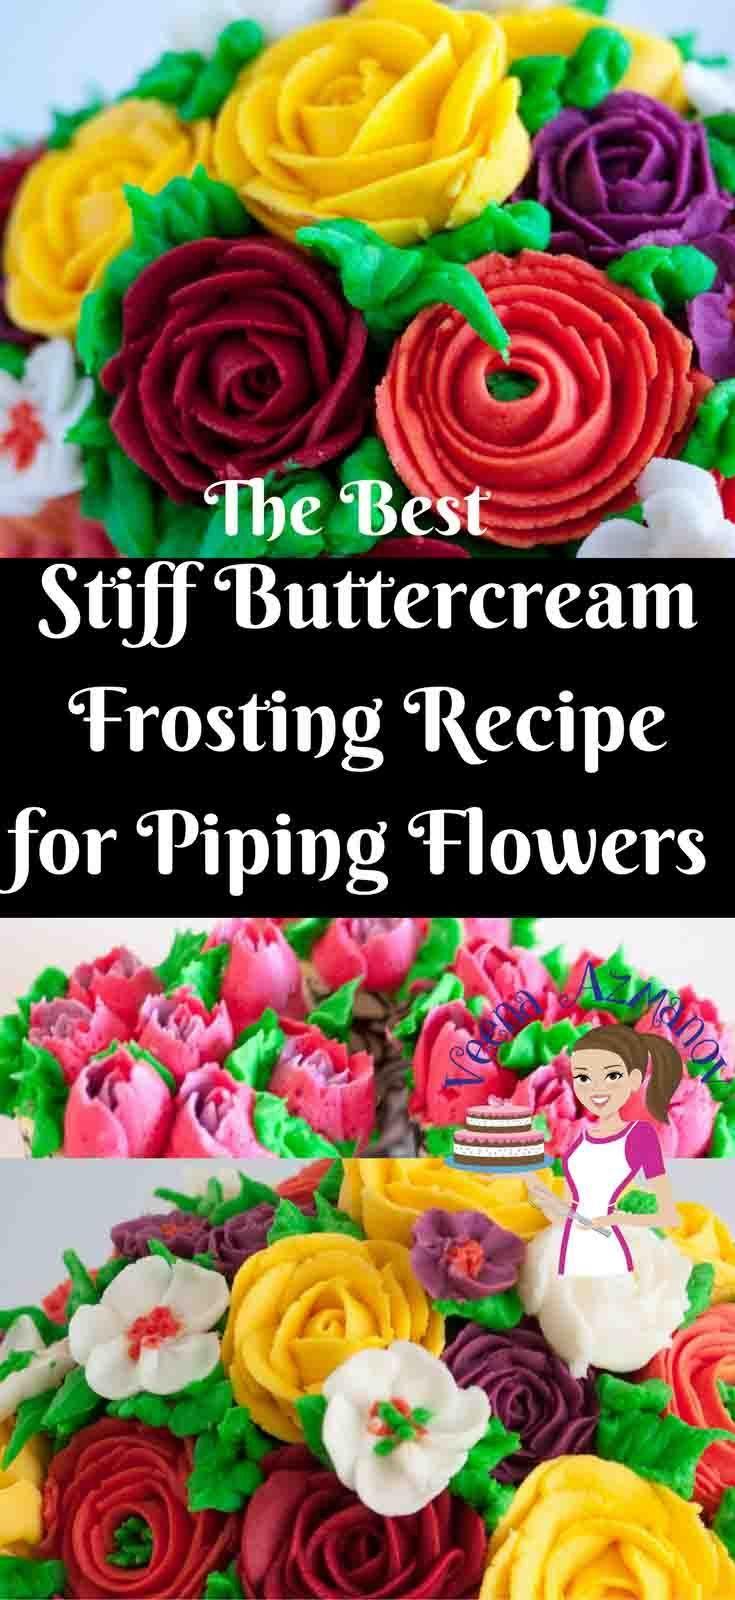 The Best Stiff Buttercream Recipe for Piping Flowers - Crusting Buttercream Recipe - Veena Azmanov